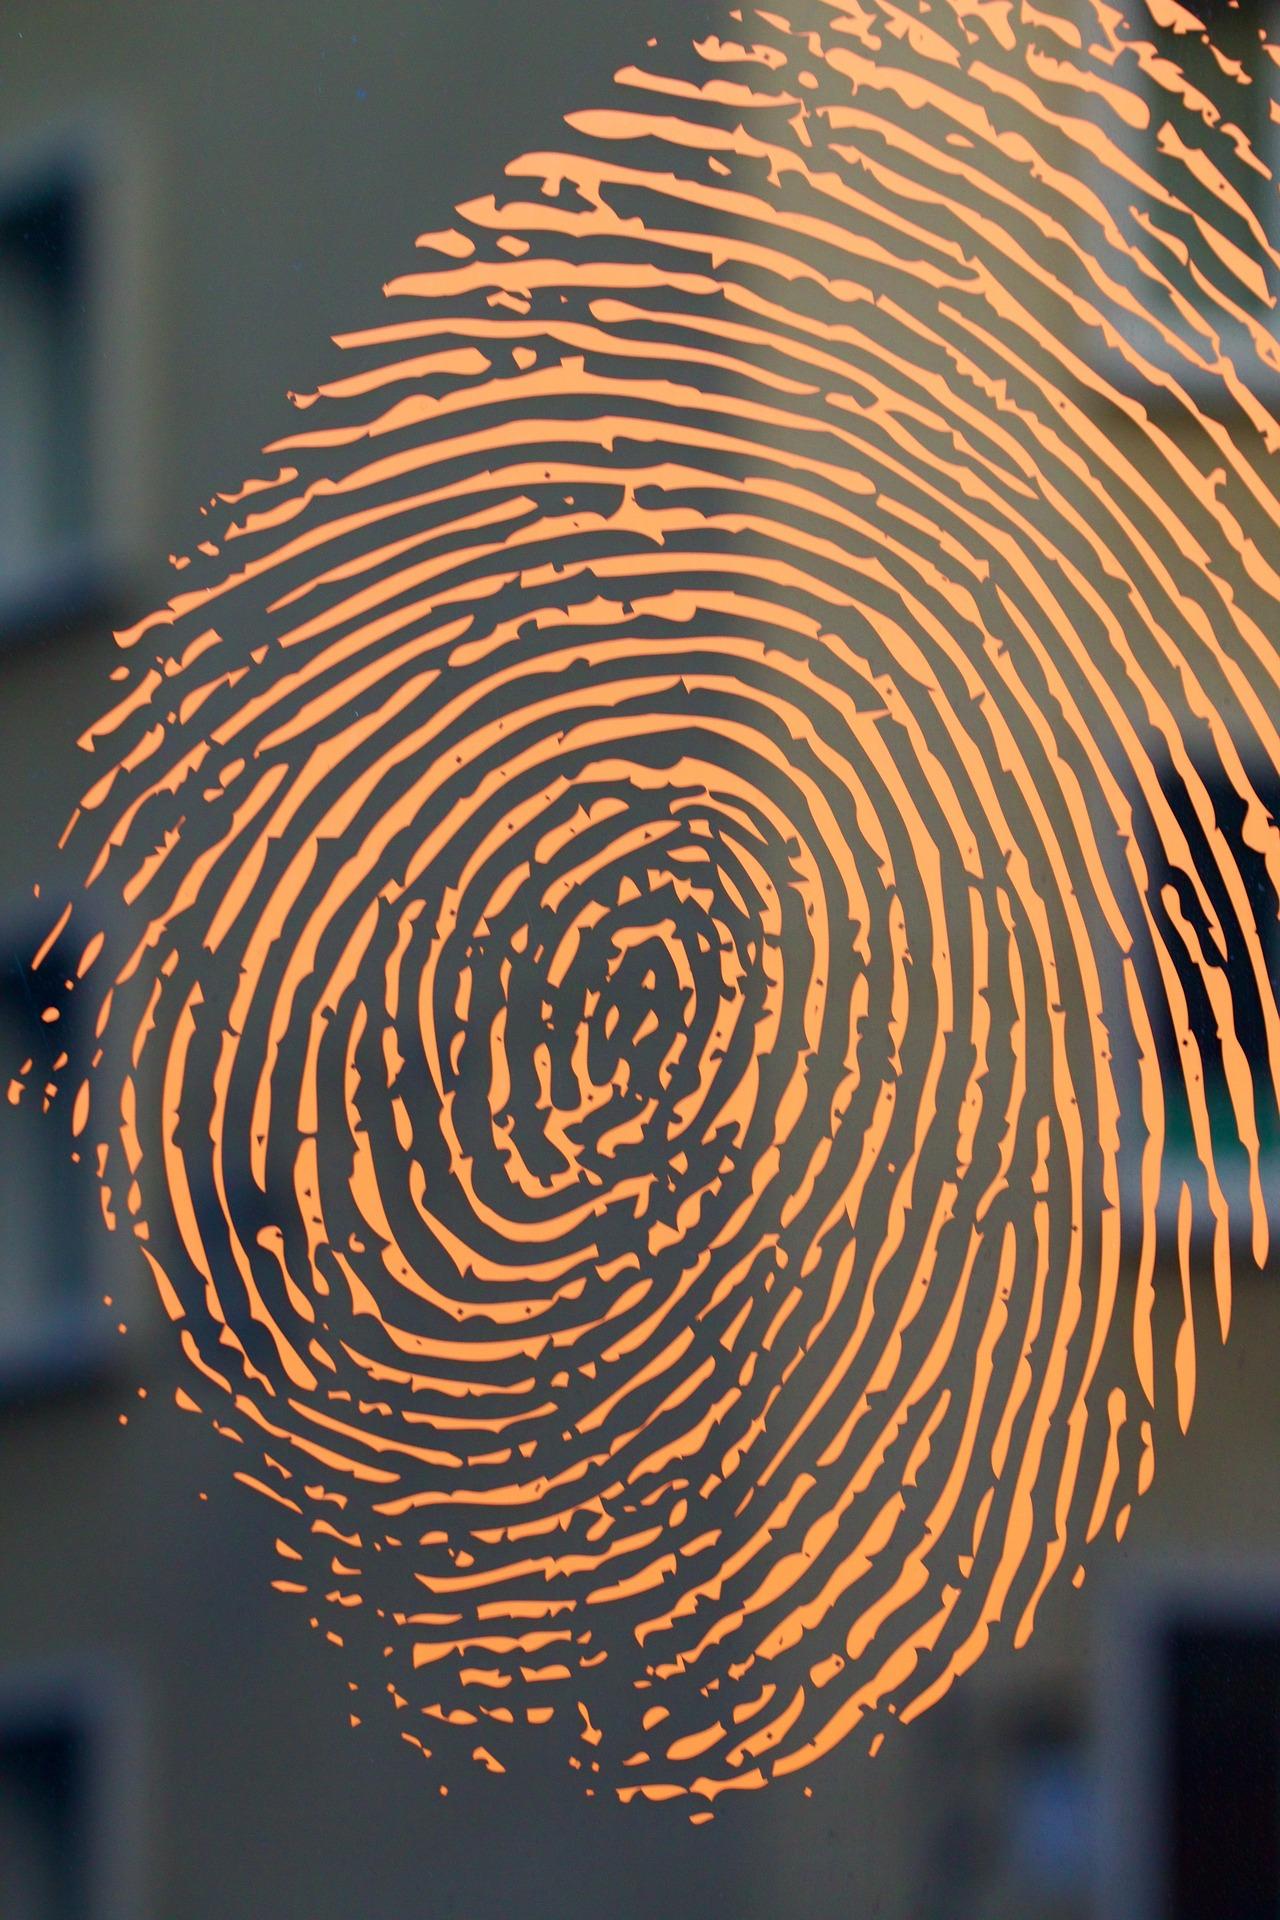 Psicología forense dins l'àmbit penal